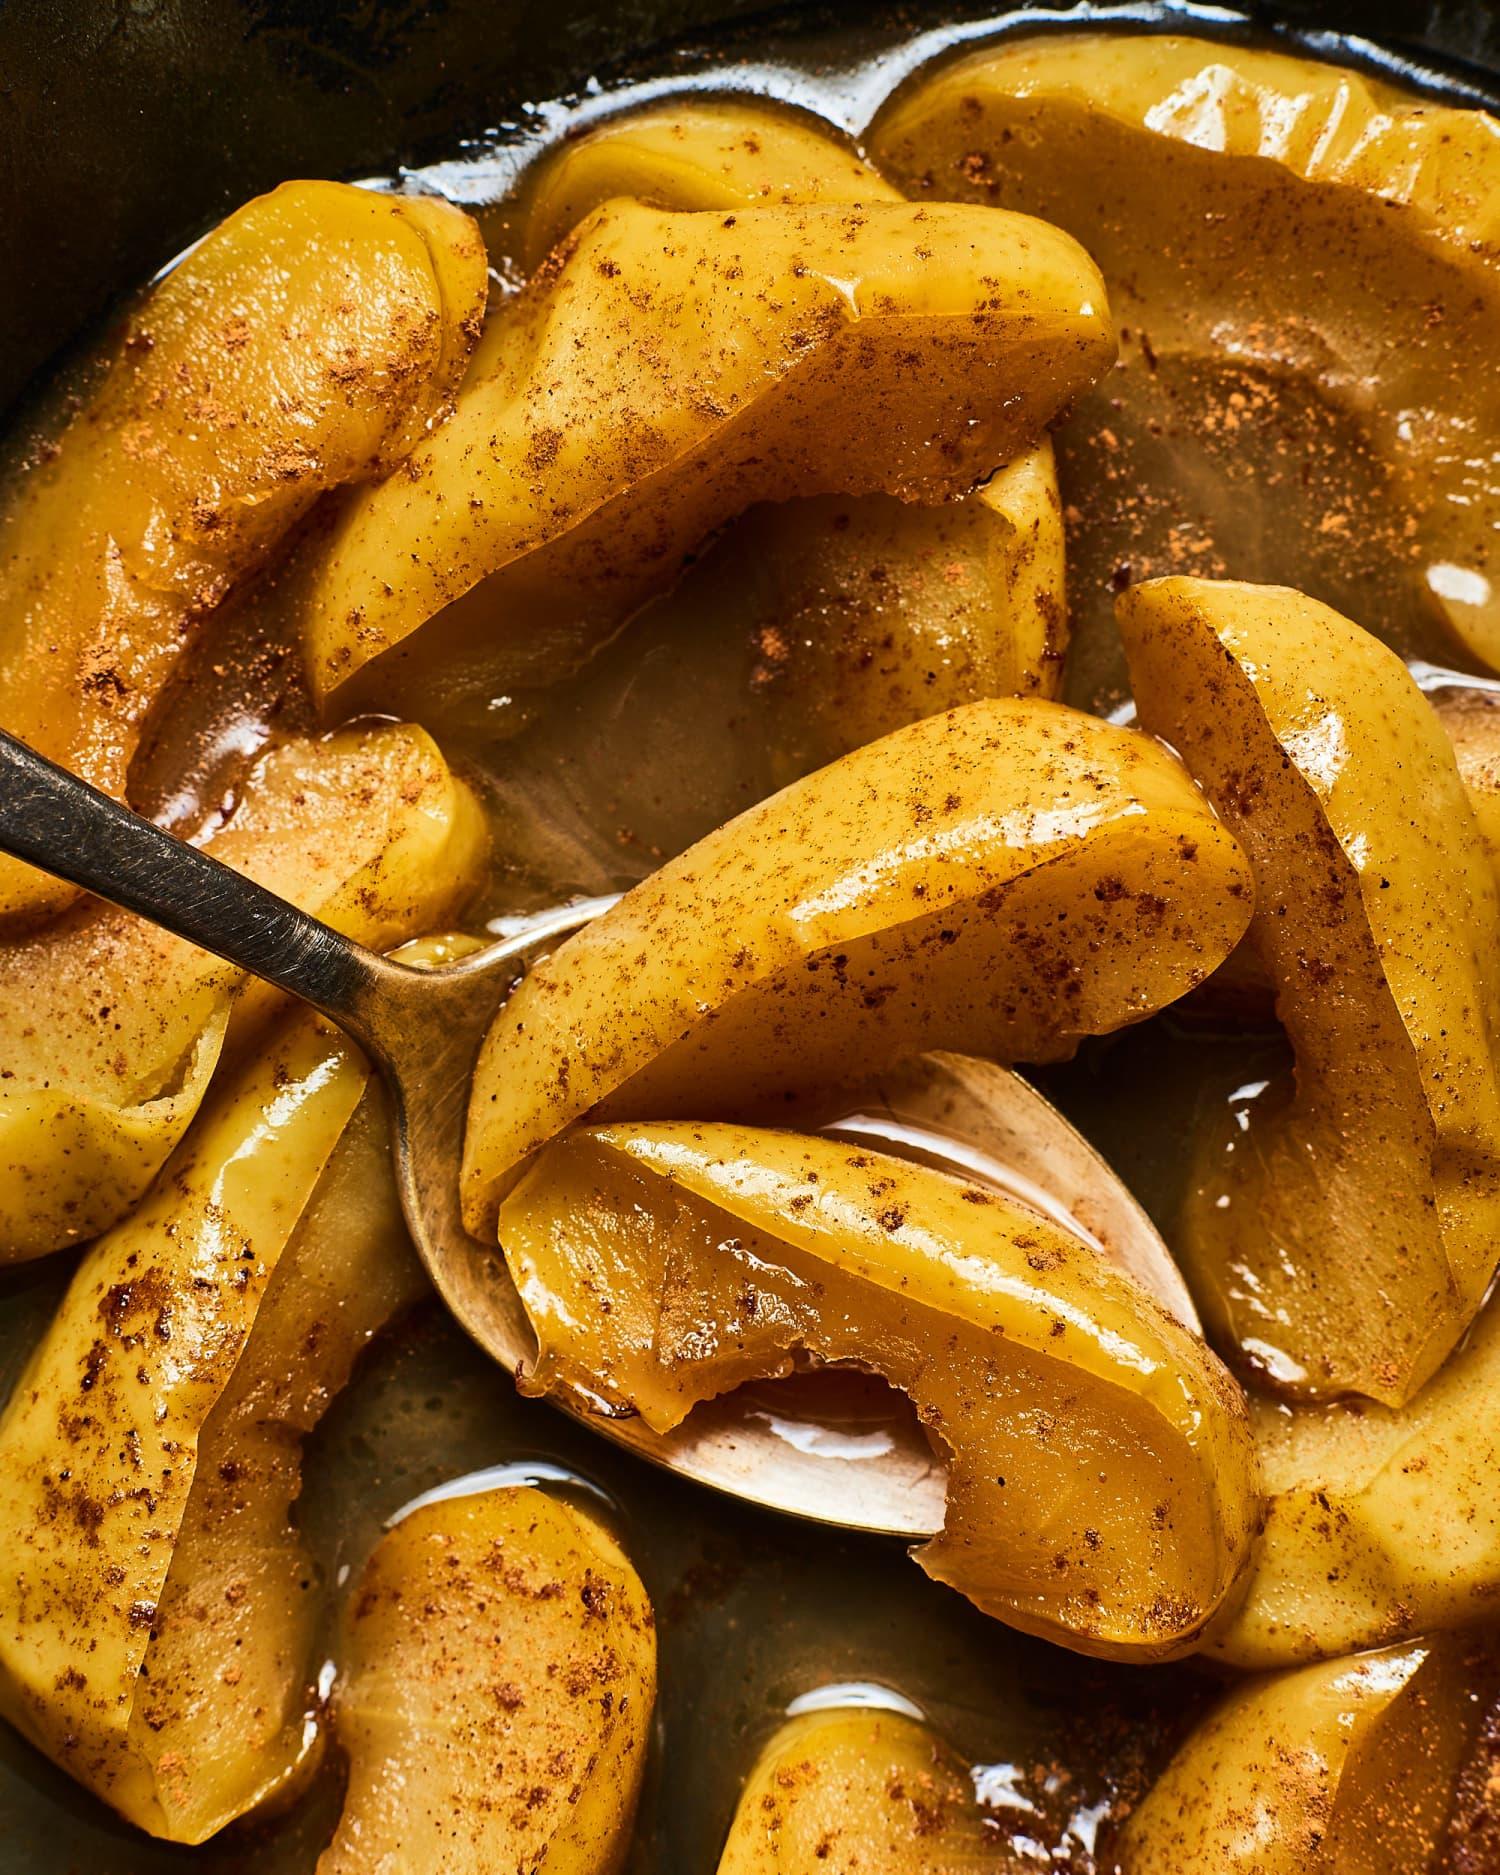 Recipe: Better-than-Cracker Barrel Skillet Fried Apples